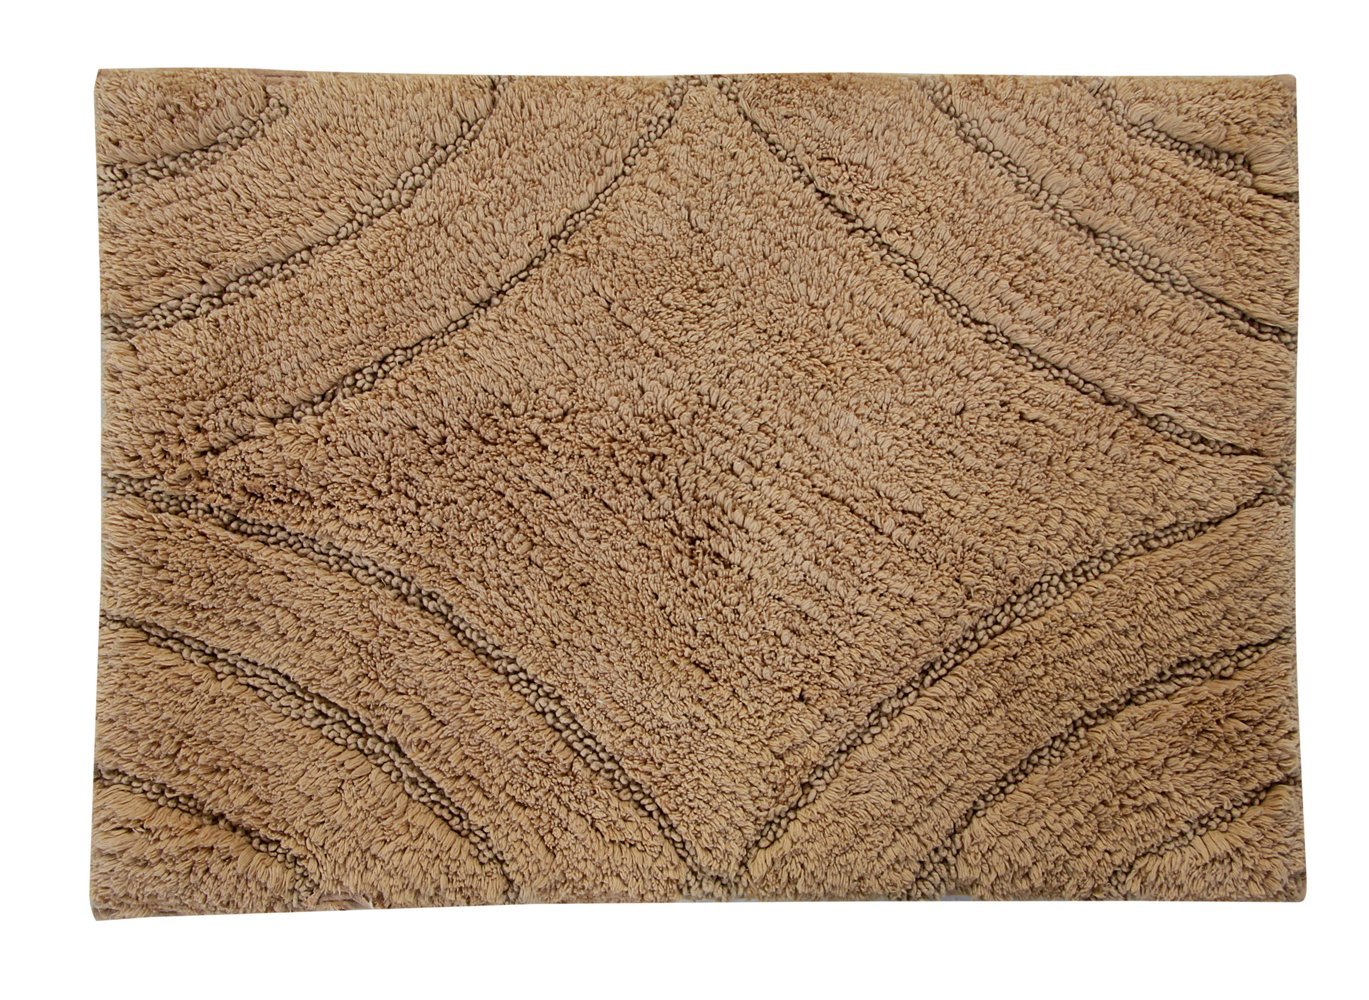 Castle Hill 20 W x 30 L Bathroom Rug Taupe Textile Decor CH-BR-20x30-DMN-TP